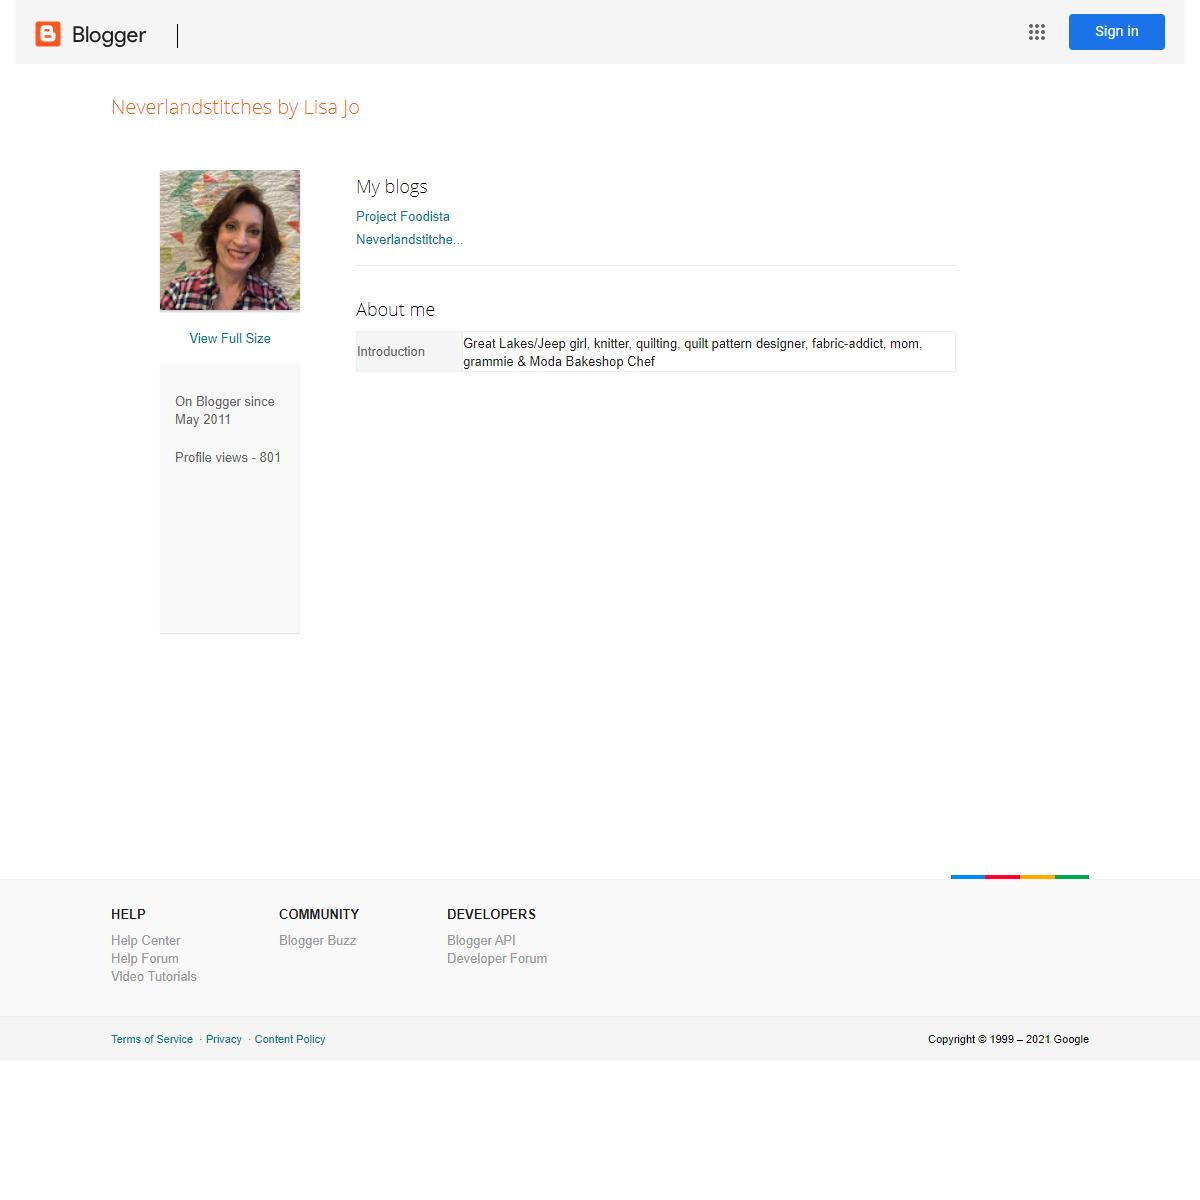 Blogger- User Profile- Neverlandstitches by Lisa Jo